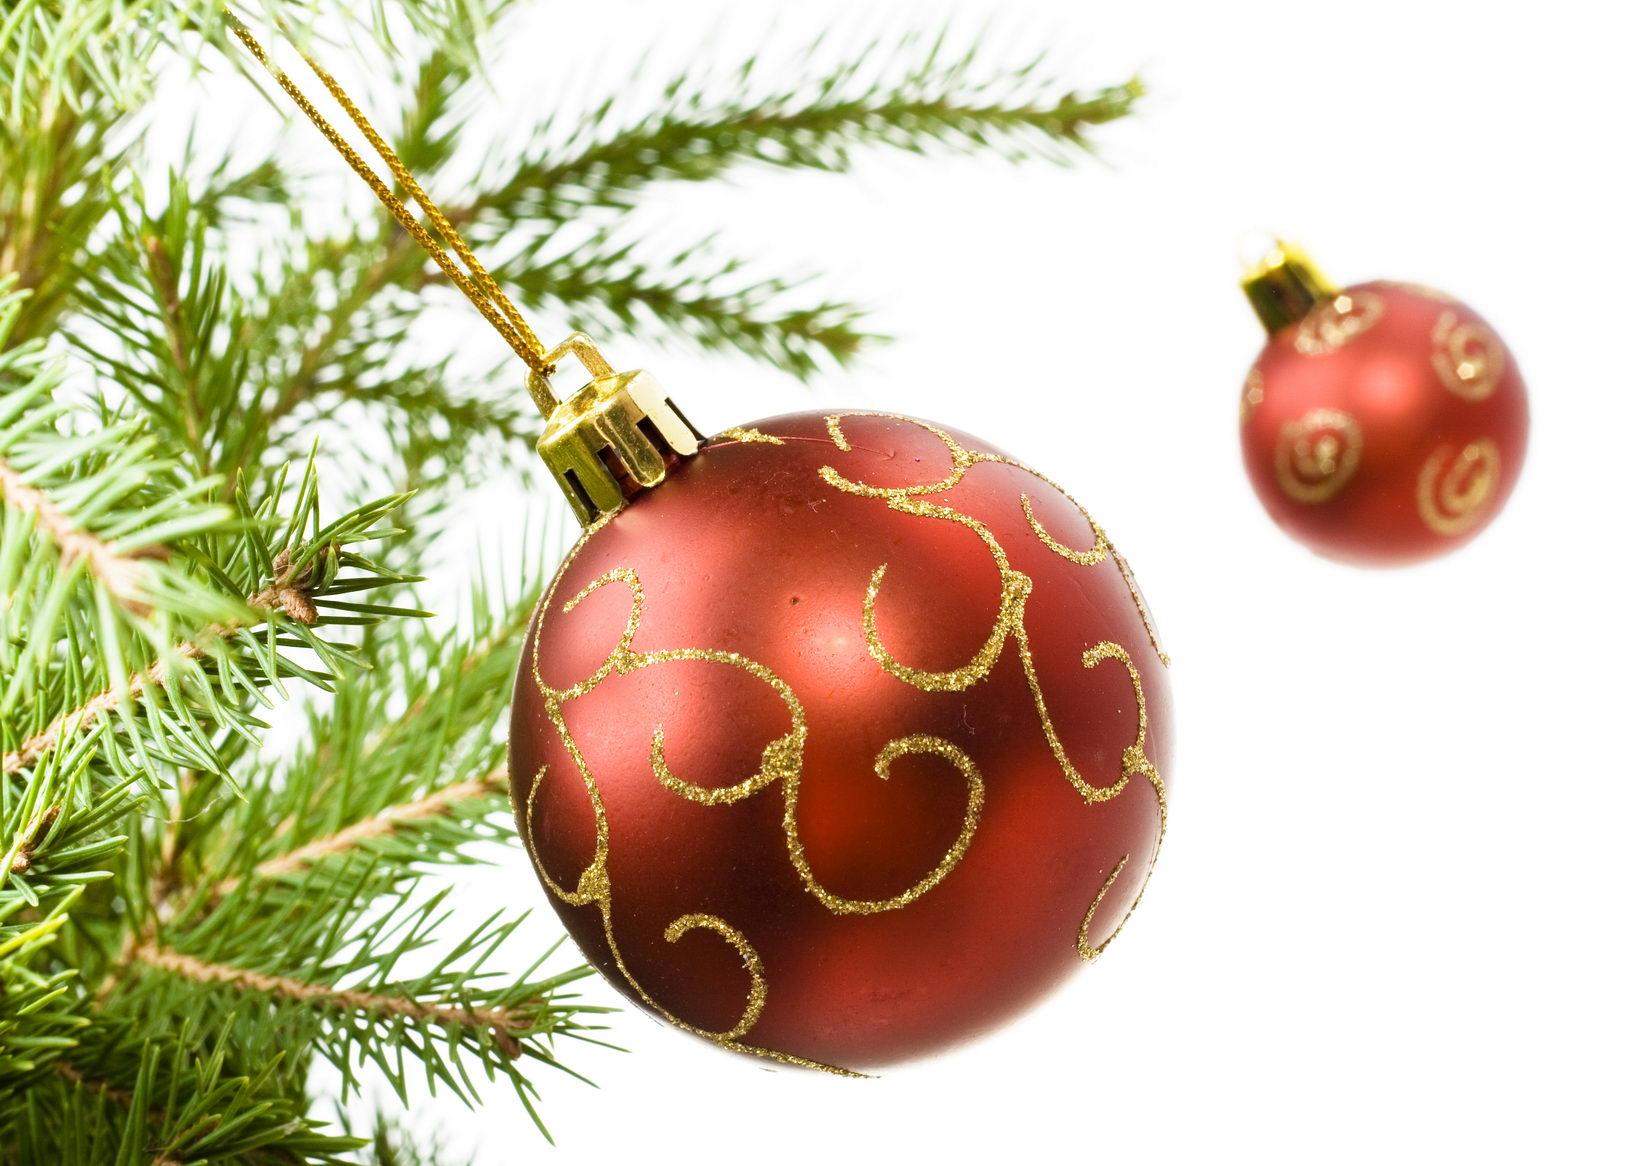 christmas decoration, Yule, Holiday, Xmas, Vibrant, HQ Photo